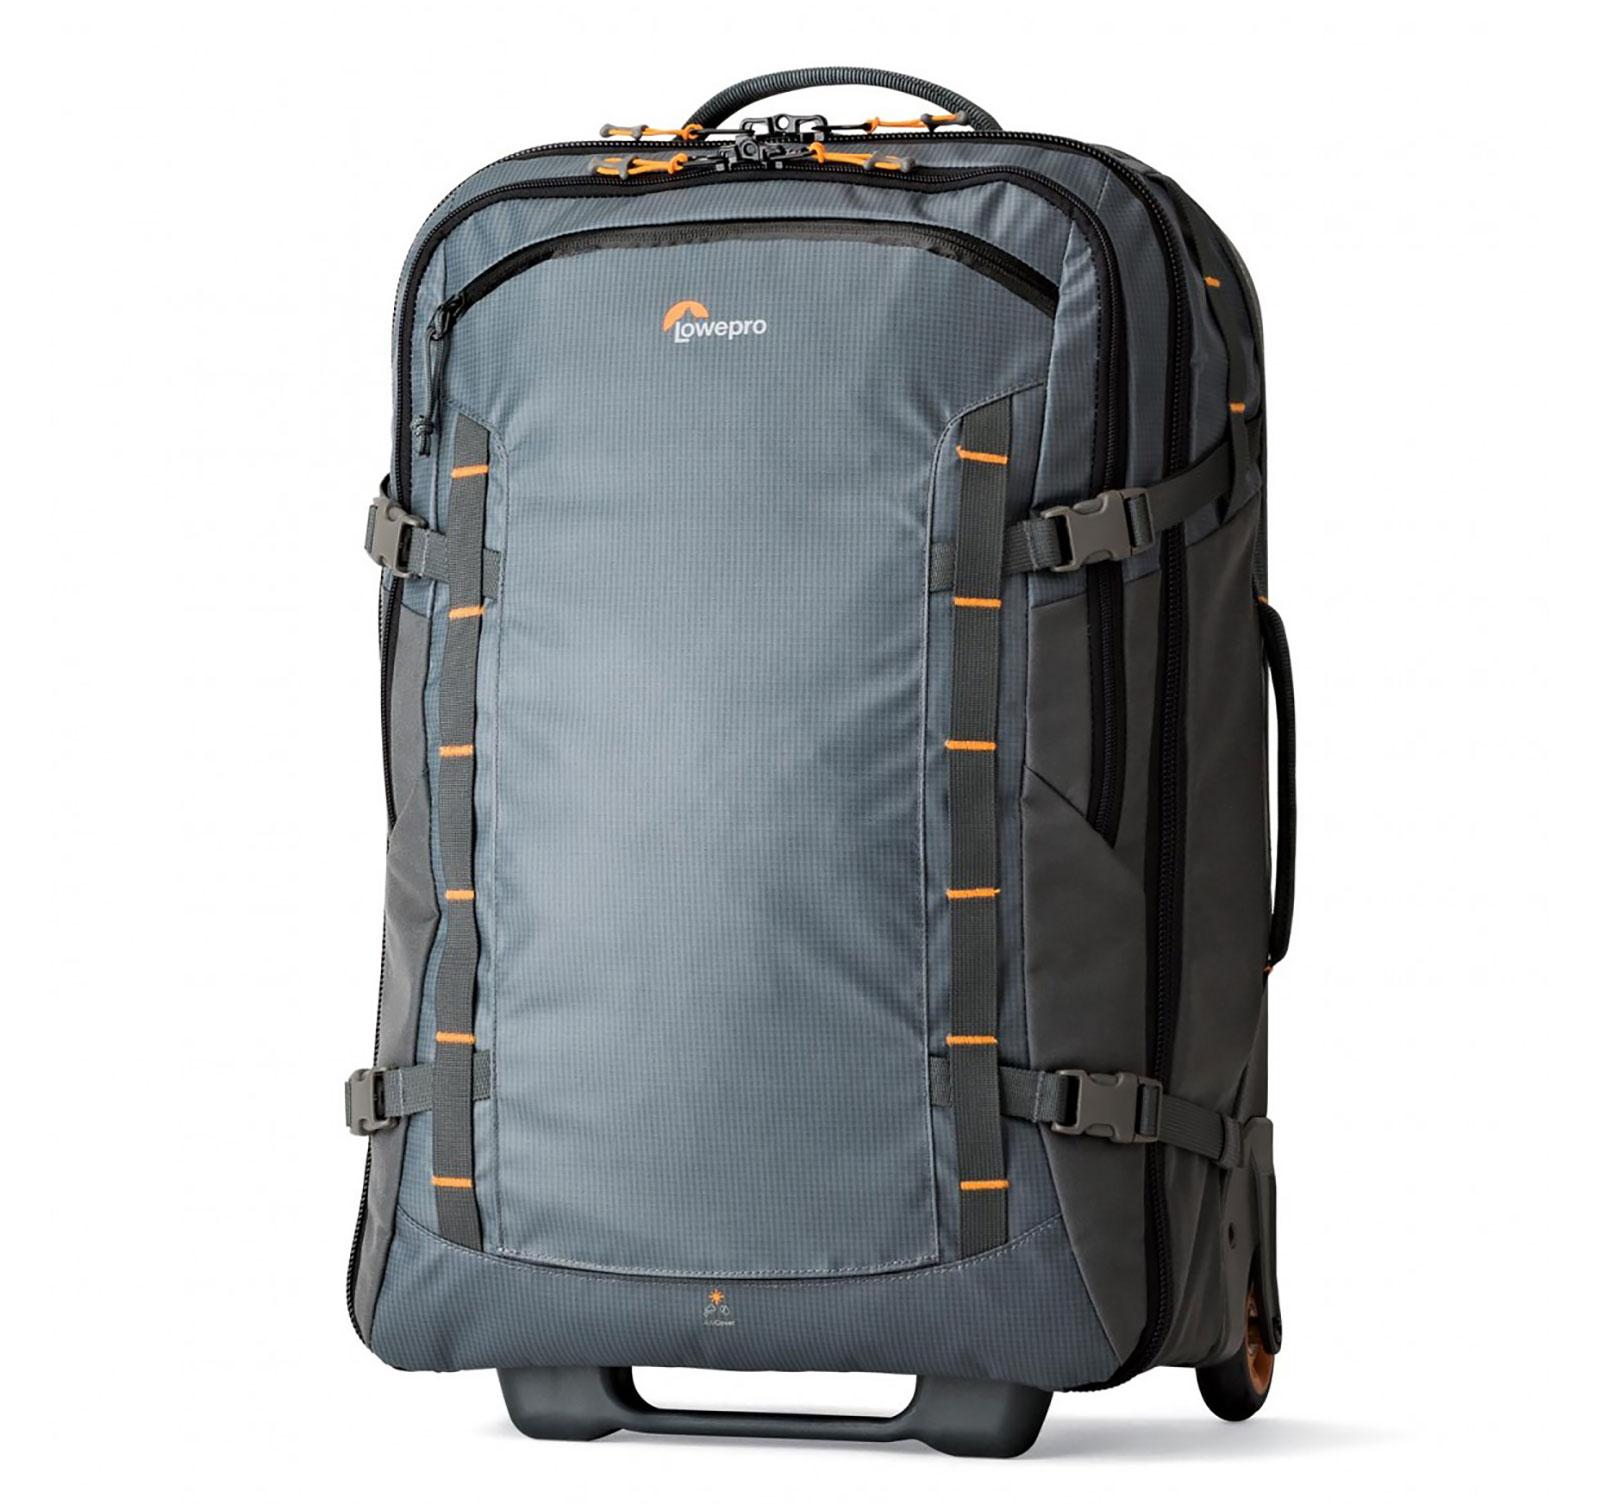 Lowepro Highline RL x400 AW Grey Rolling Travel Bag